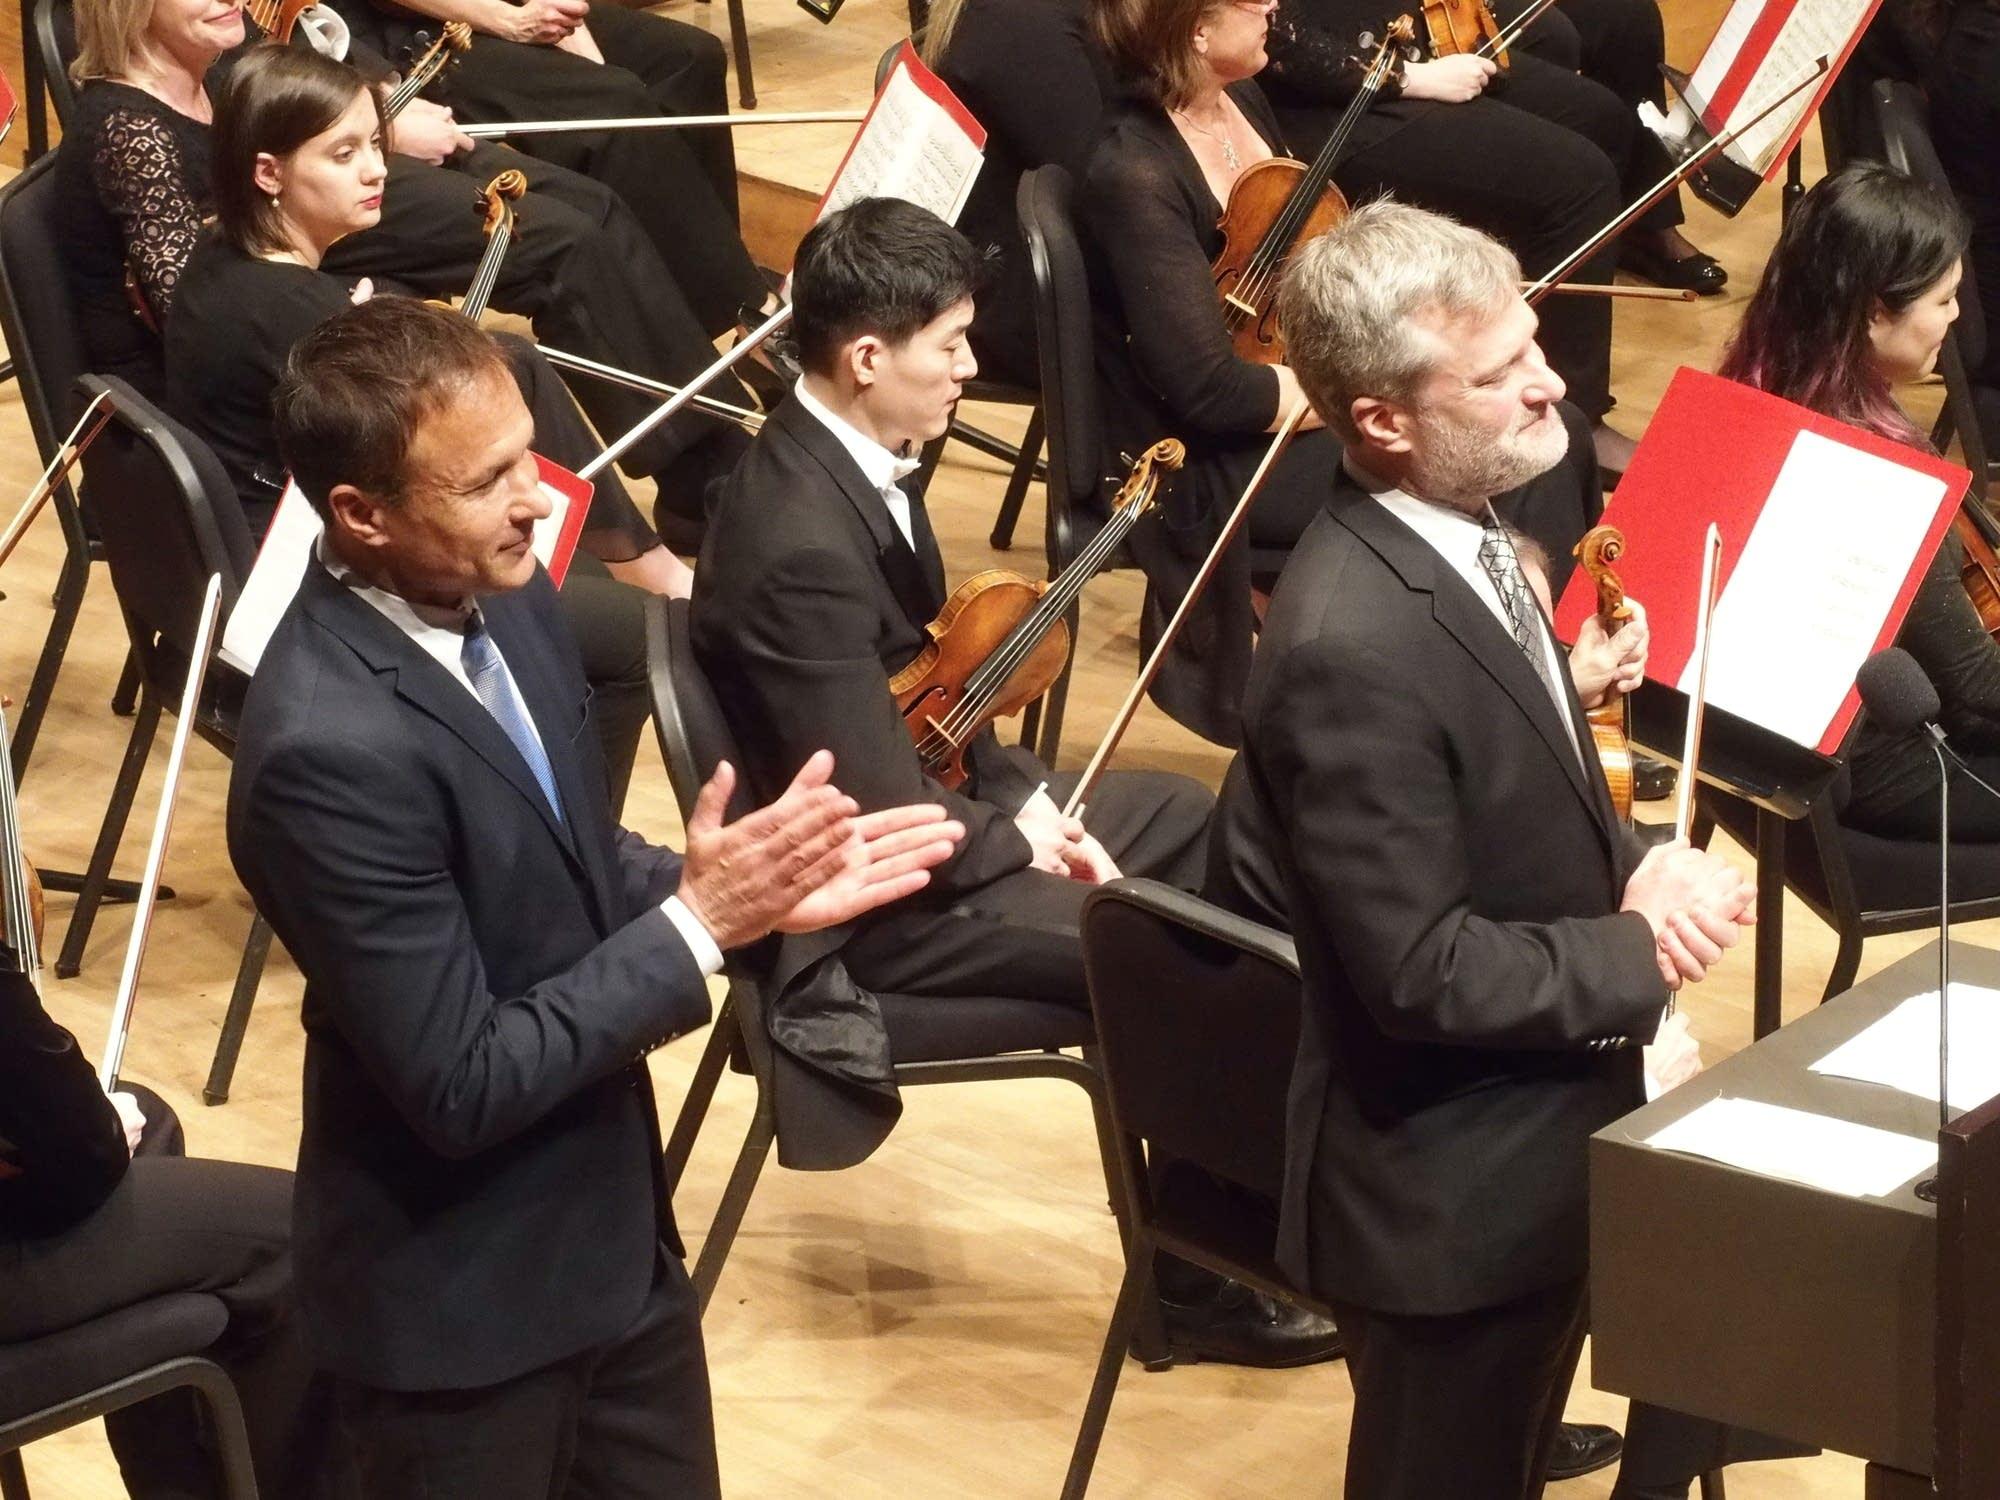 Sons Paul Sebastien (left) and Nick Skrowaczewski